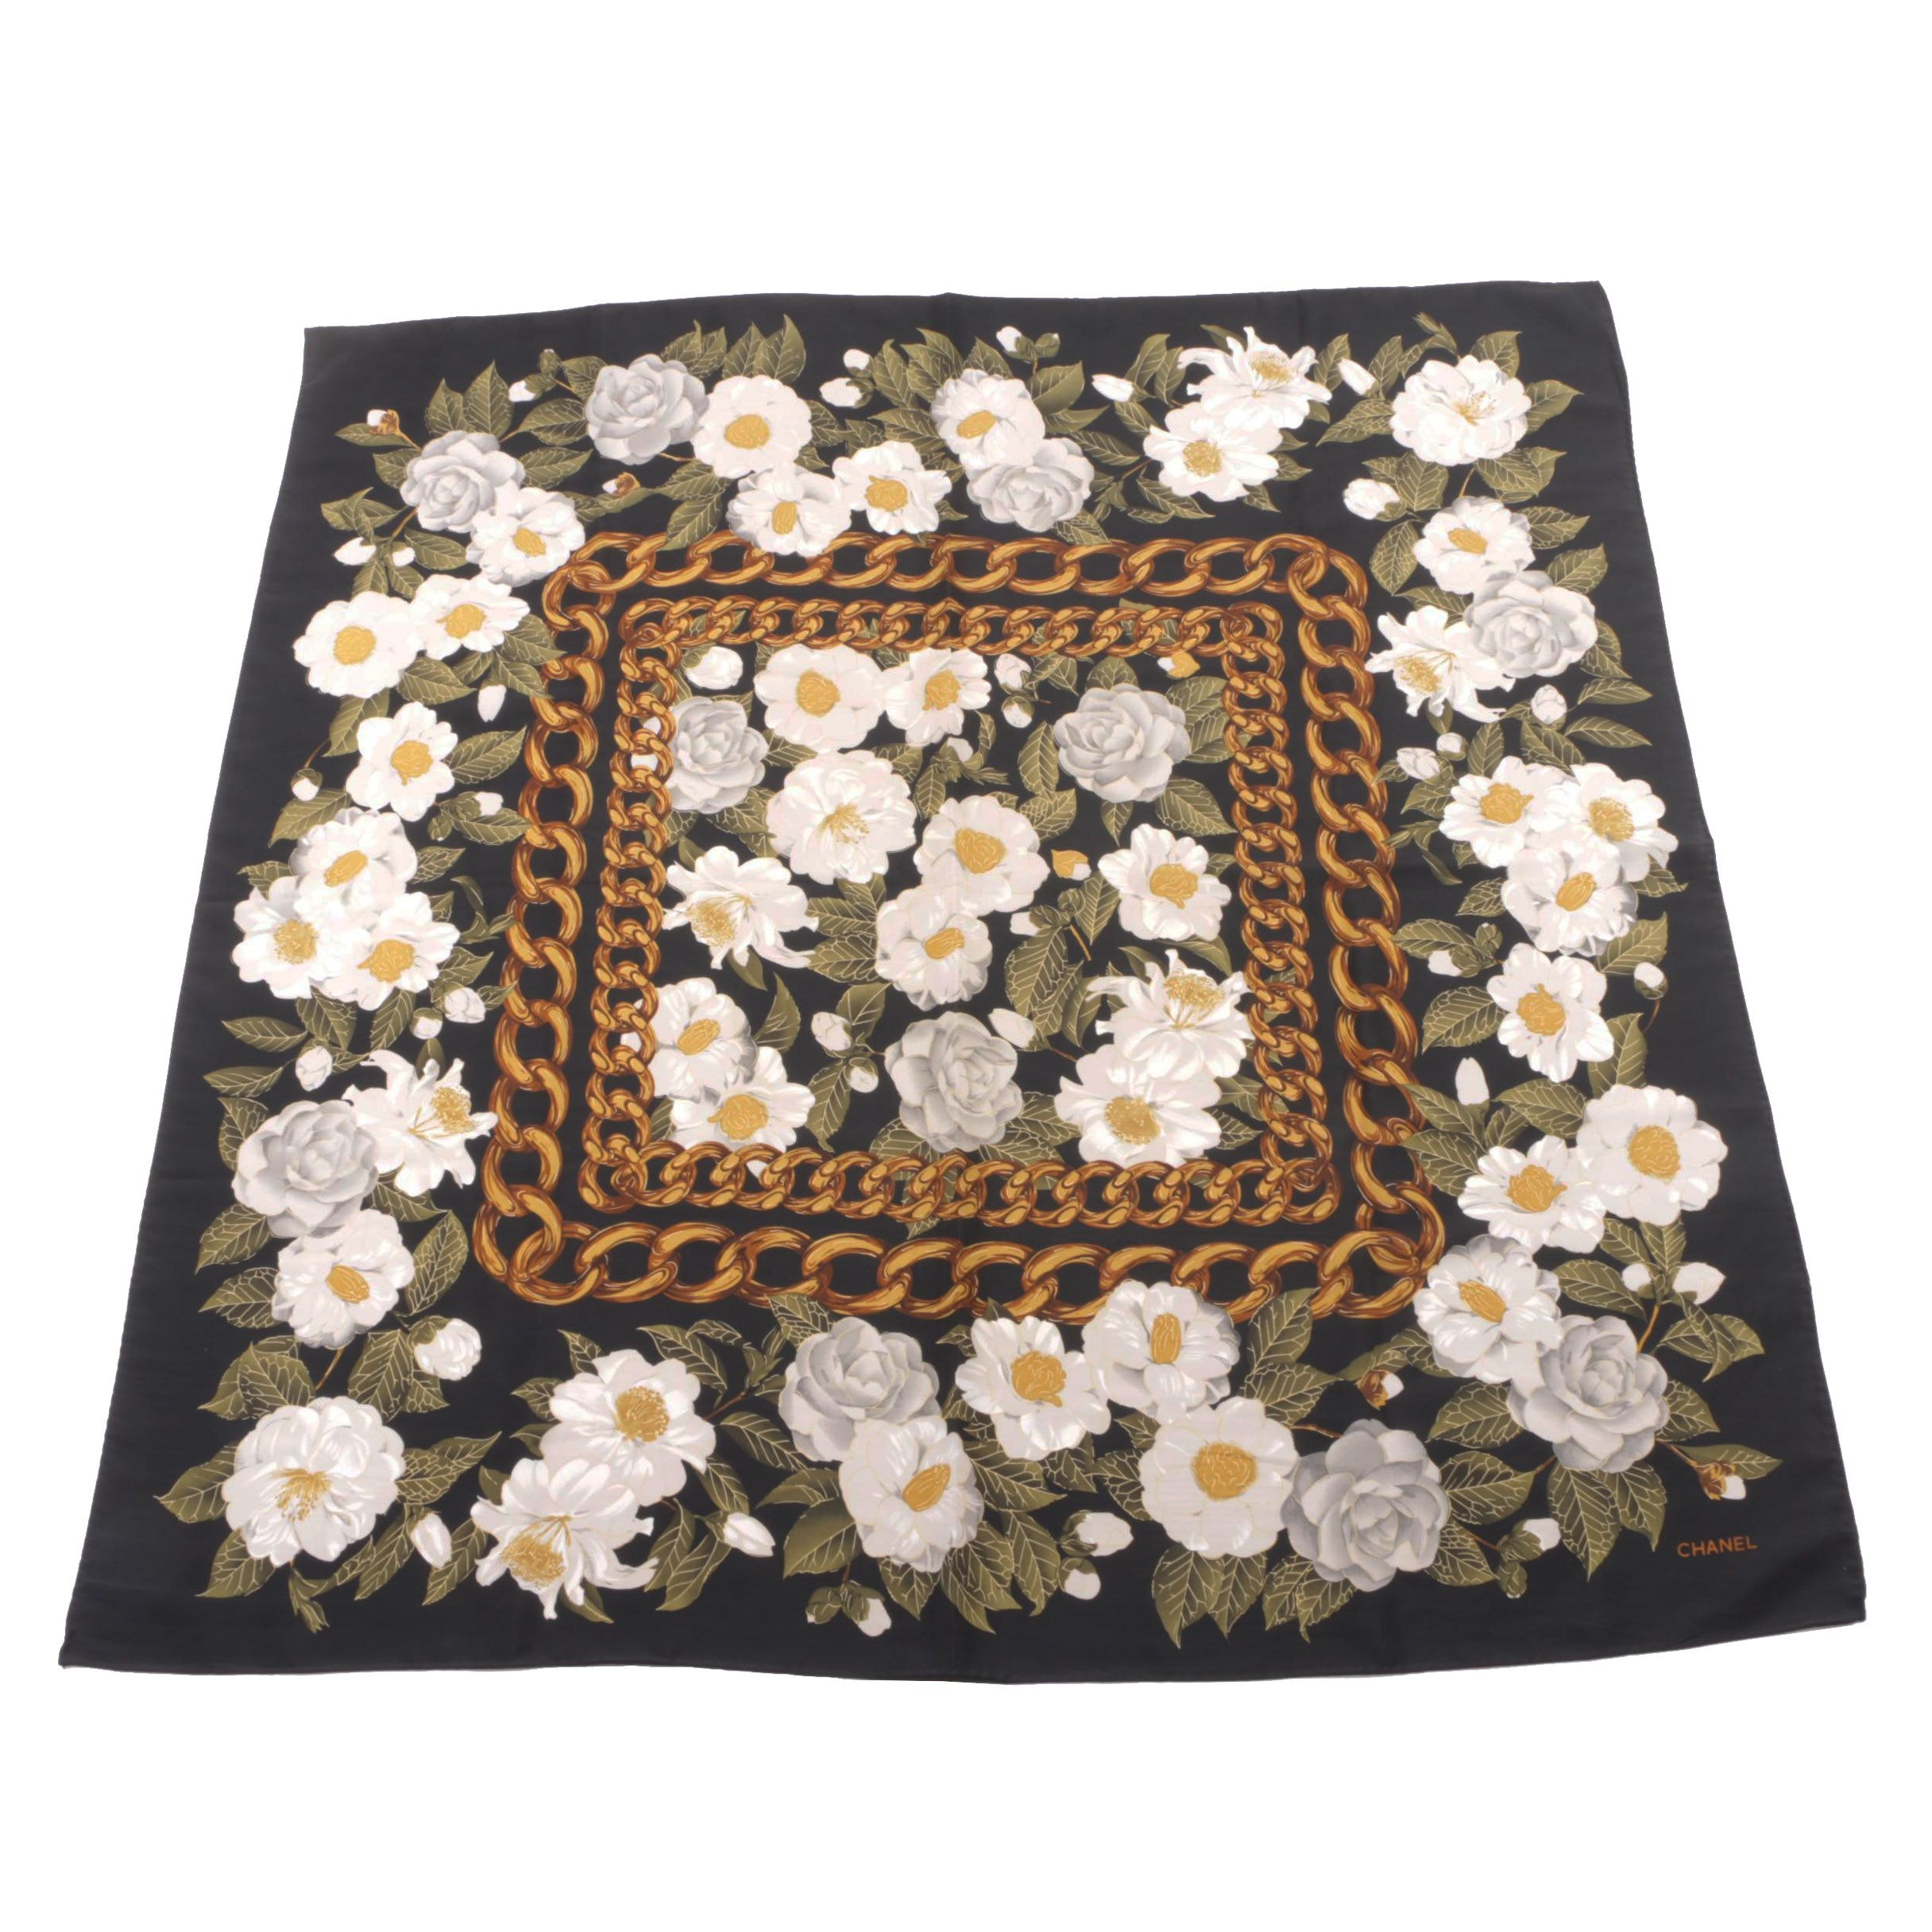 Vintage Chanel Camellia Print Silk Scarf